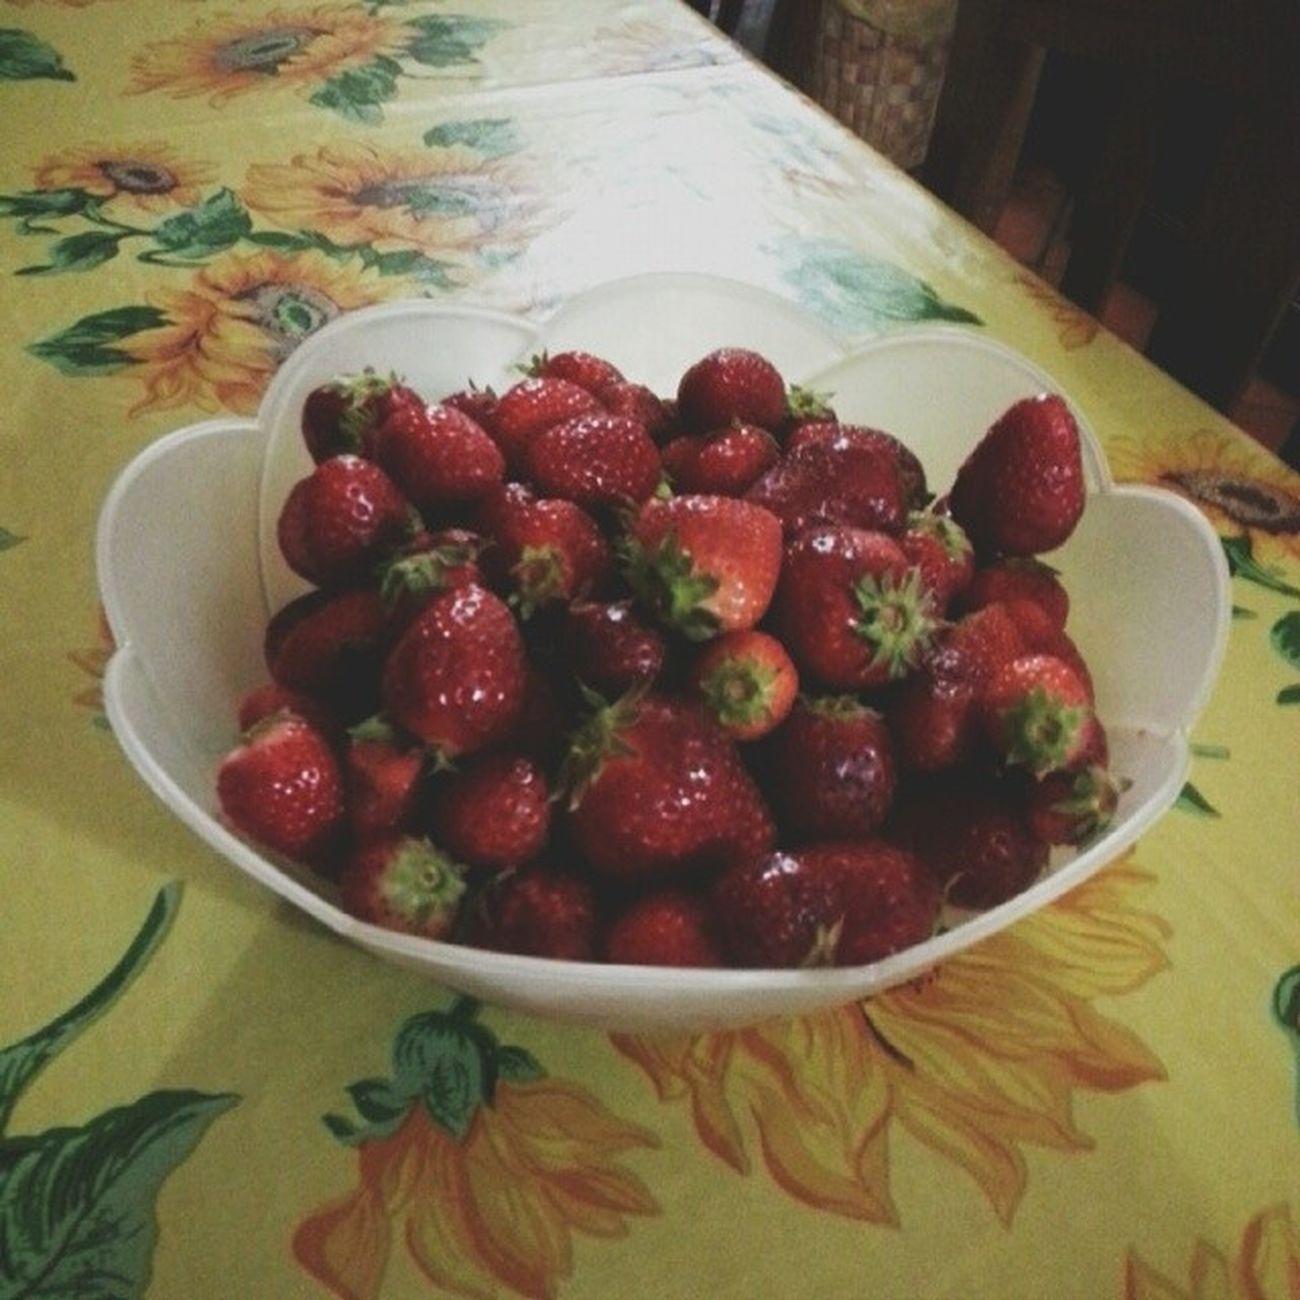 SEMU SENZA FRAGOLE 100happydays Happyday48 Fragole Strawberries fragole summer summeriscoming tagforlike tagforfollower followme mangiare food